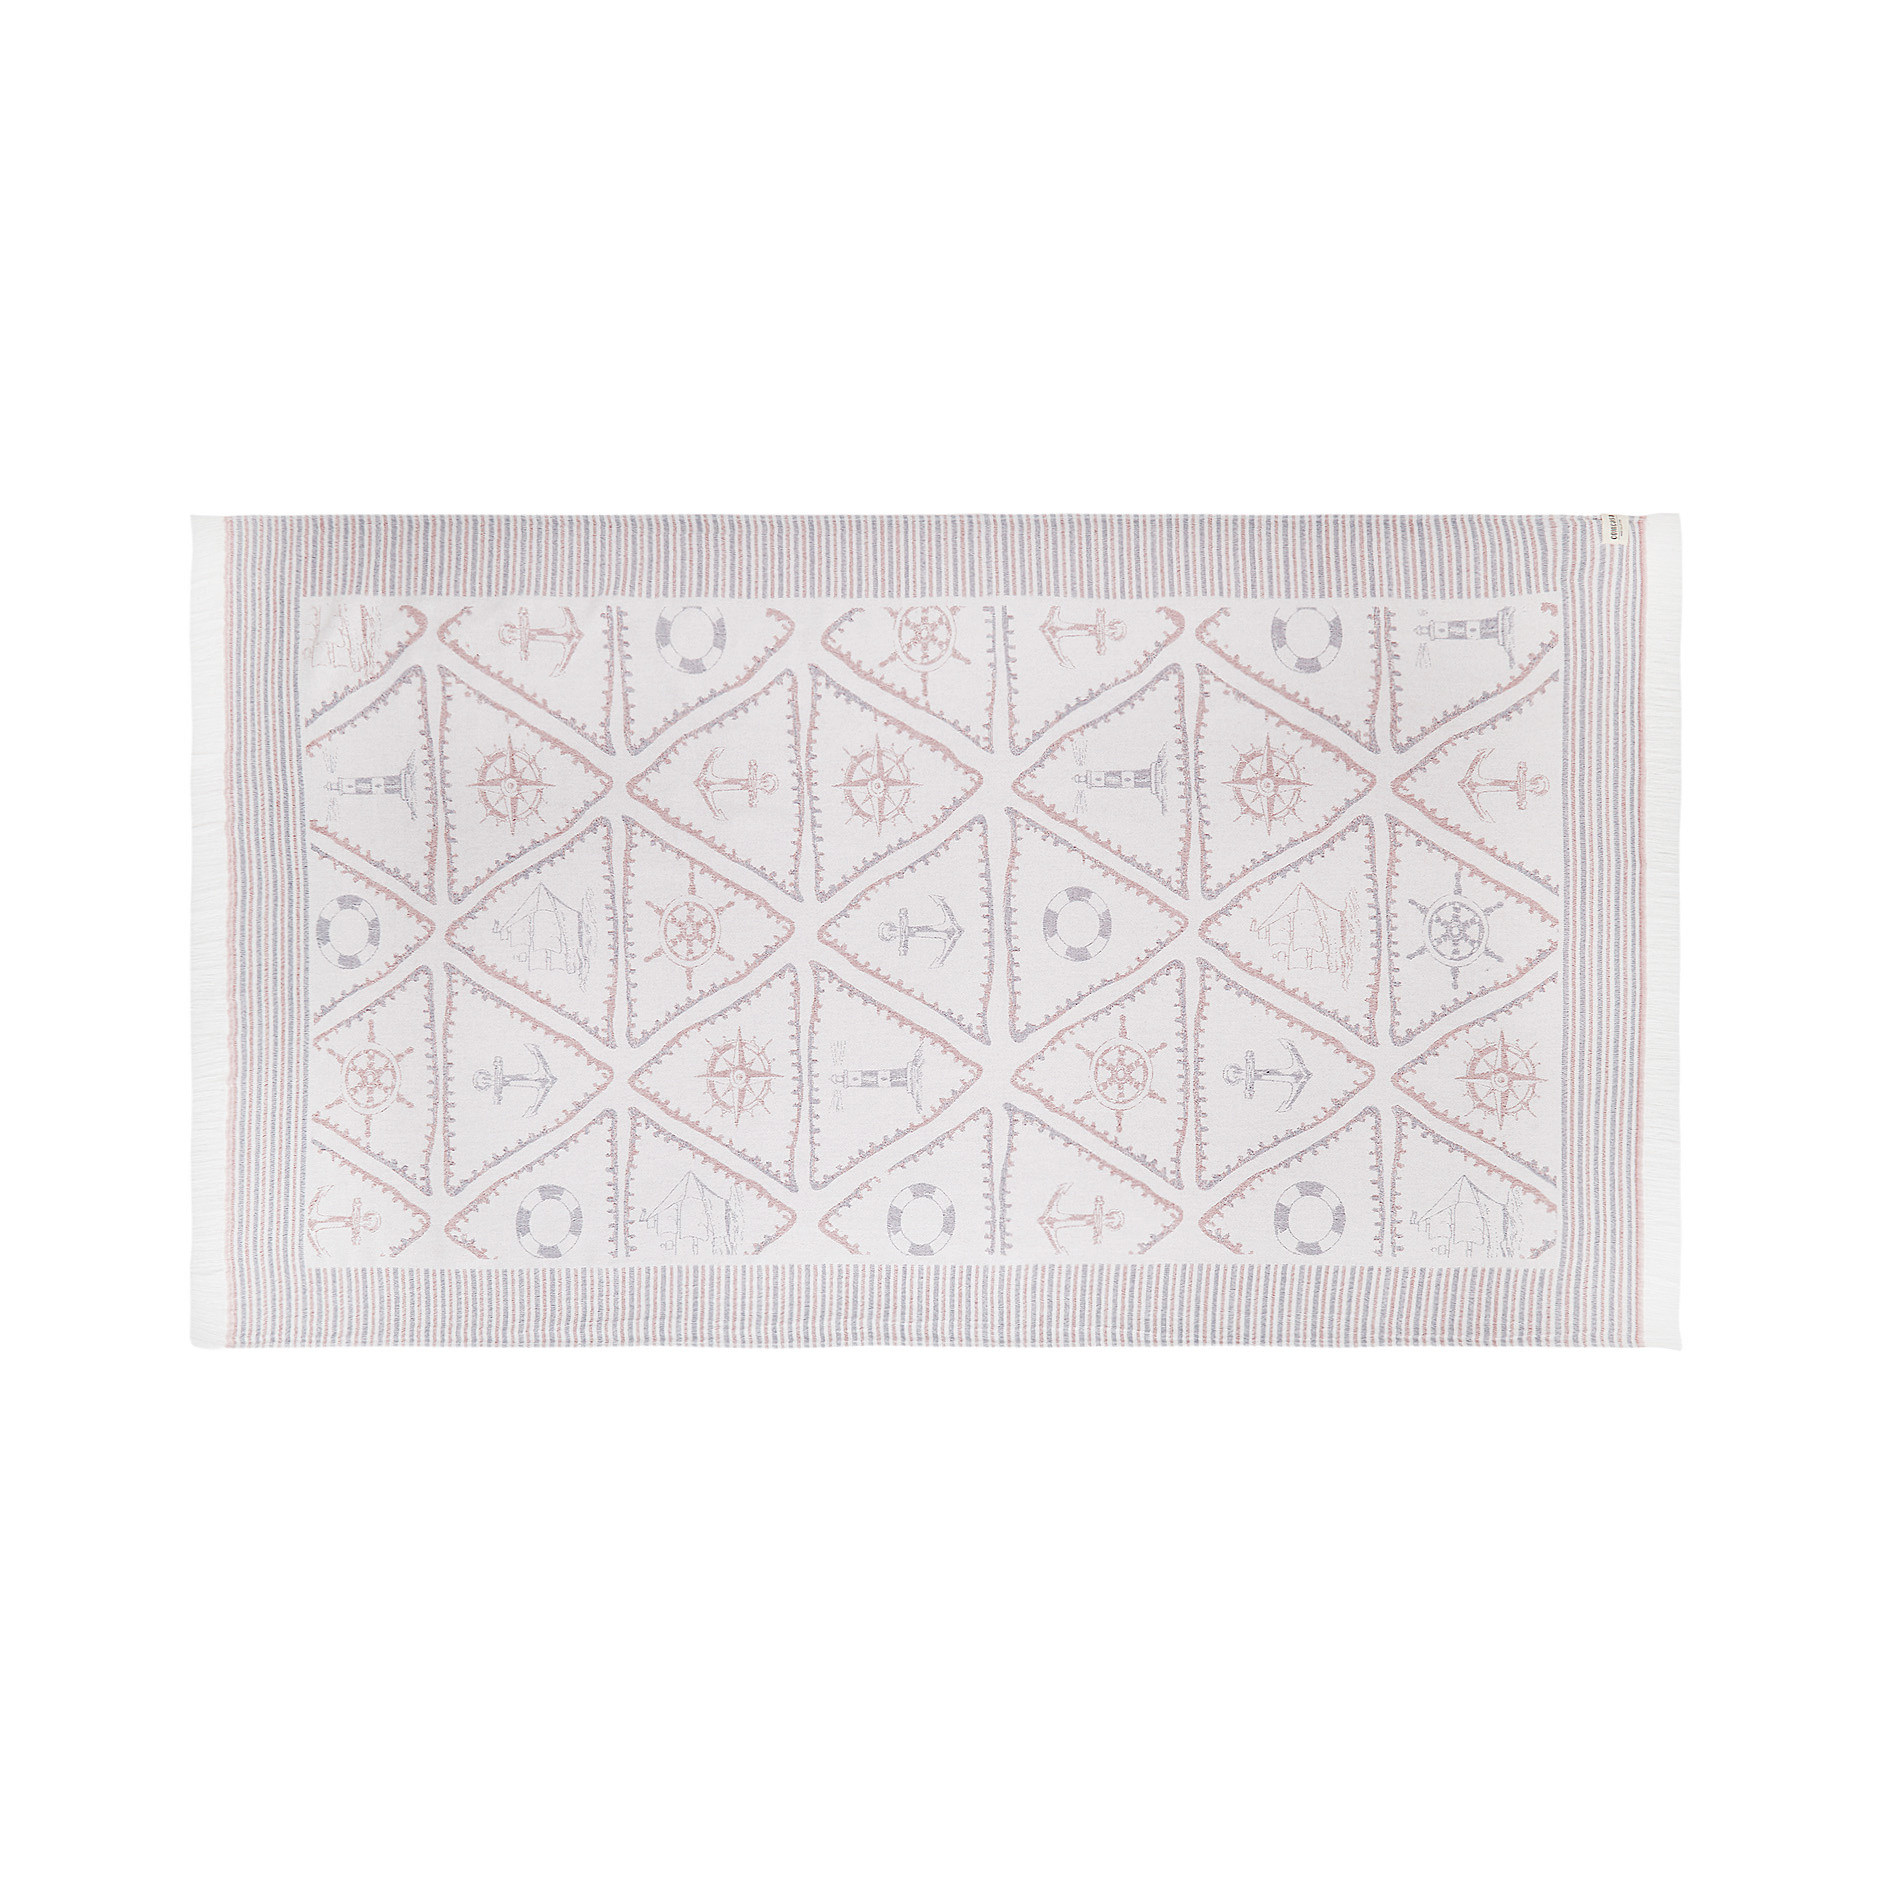 Telo mare cotone leggero motivo triangoli, Bianco, large image number 0